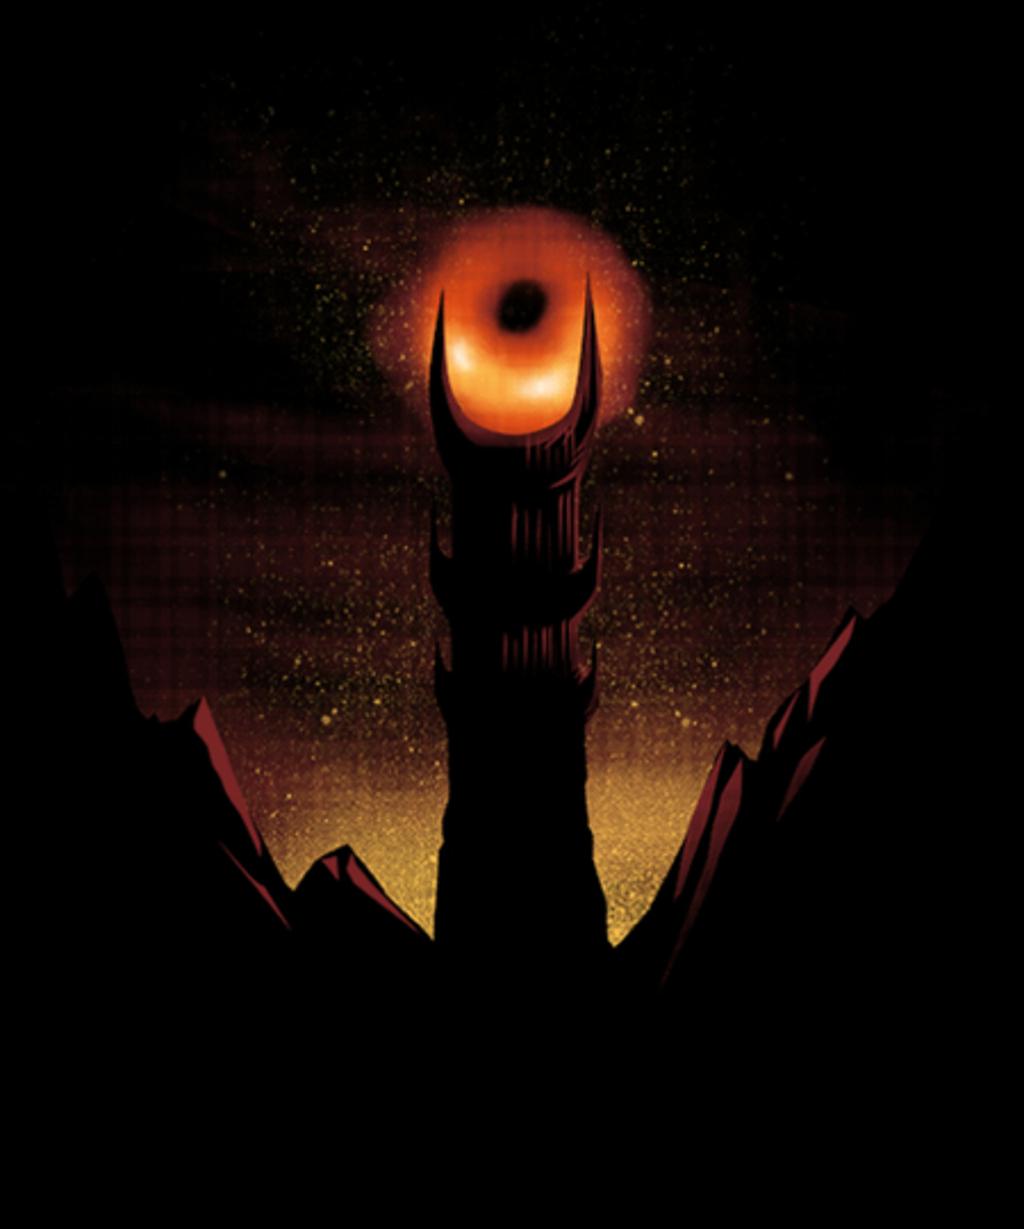 Qwertee: Blackhole Sauron